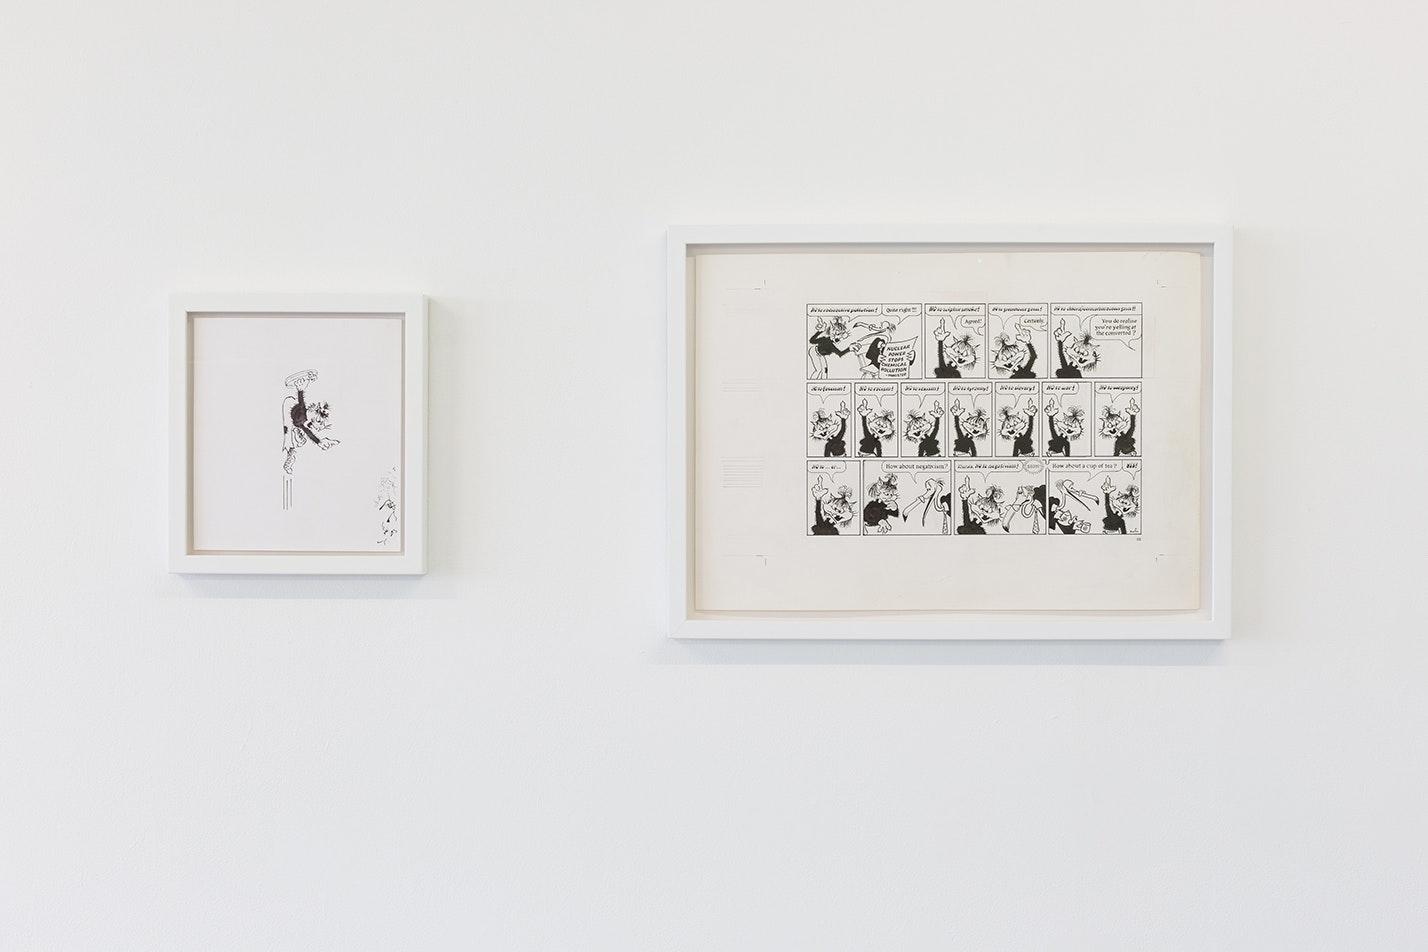 Donald Rooum, original drawings for comic strip, 1975–2014. Photo by Tom Nolan.